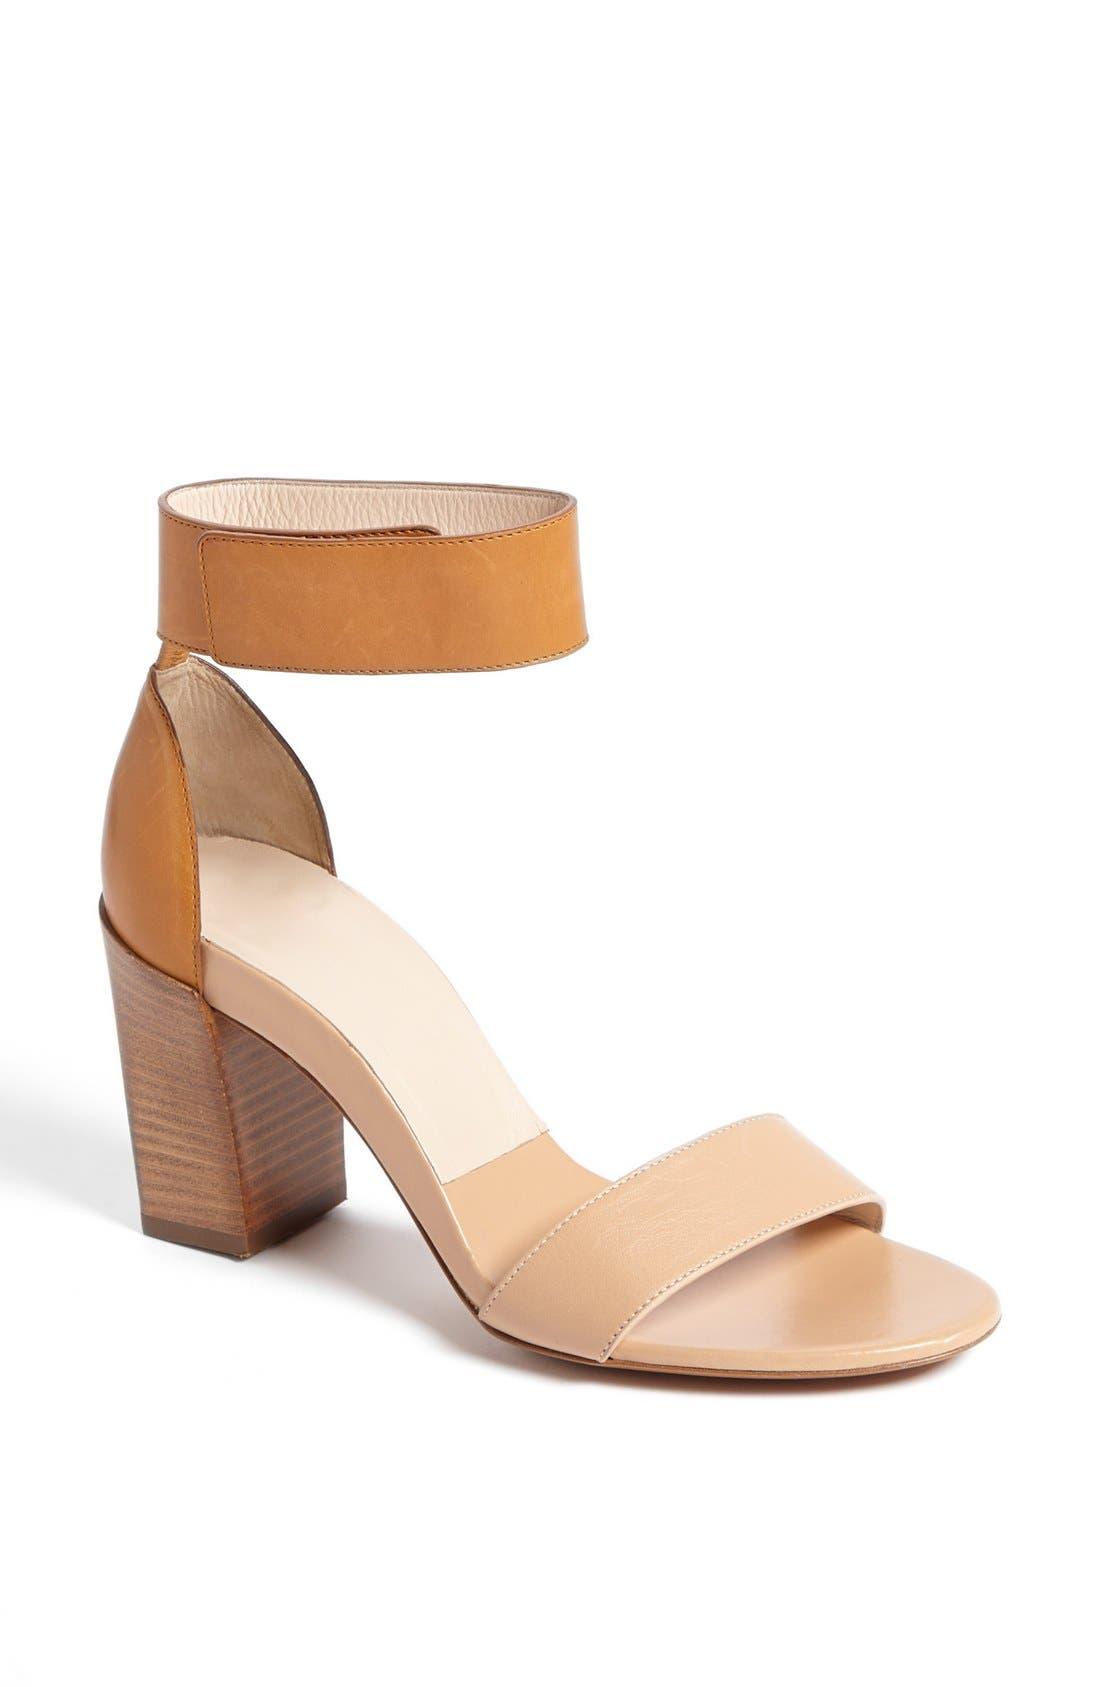 Main Image - Chloé 'Gala - Soft Apricot' Sandal